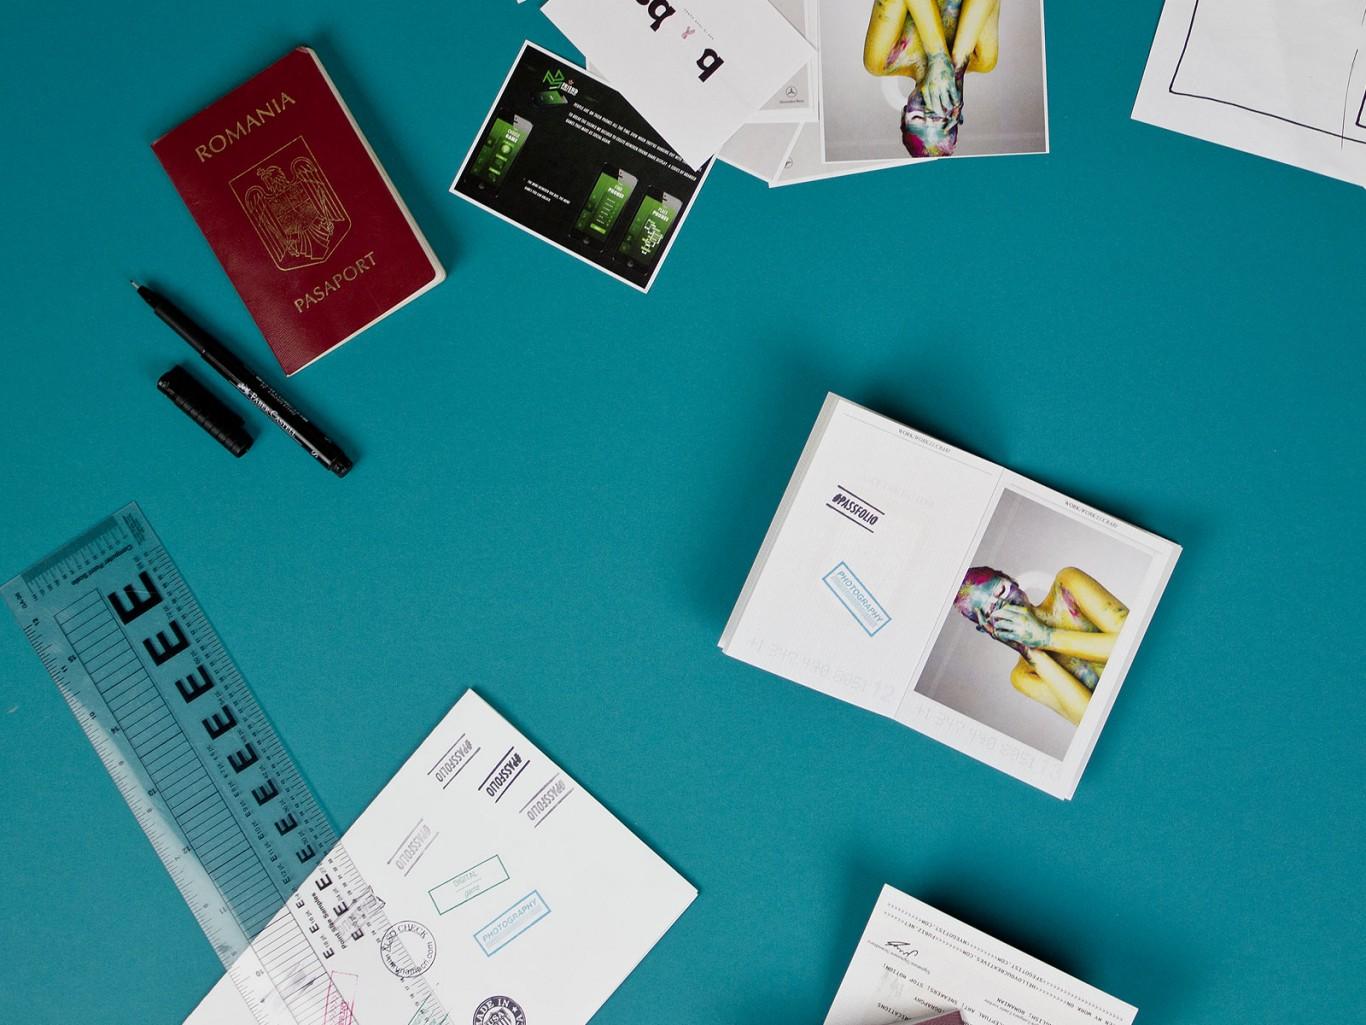 Weekoverzicht: Passfolio, Fiona Mandos, Planza.com, The Mobile Playbook, designgericht denken, Design Fusion & Pencil